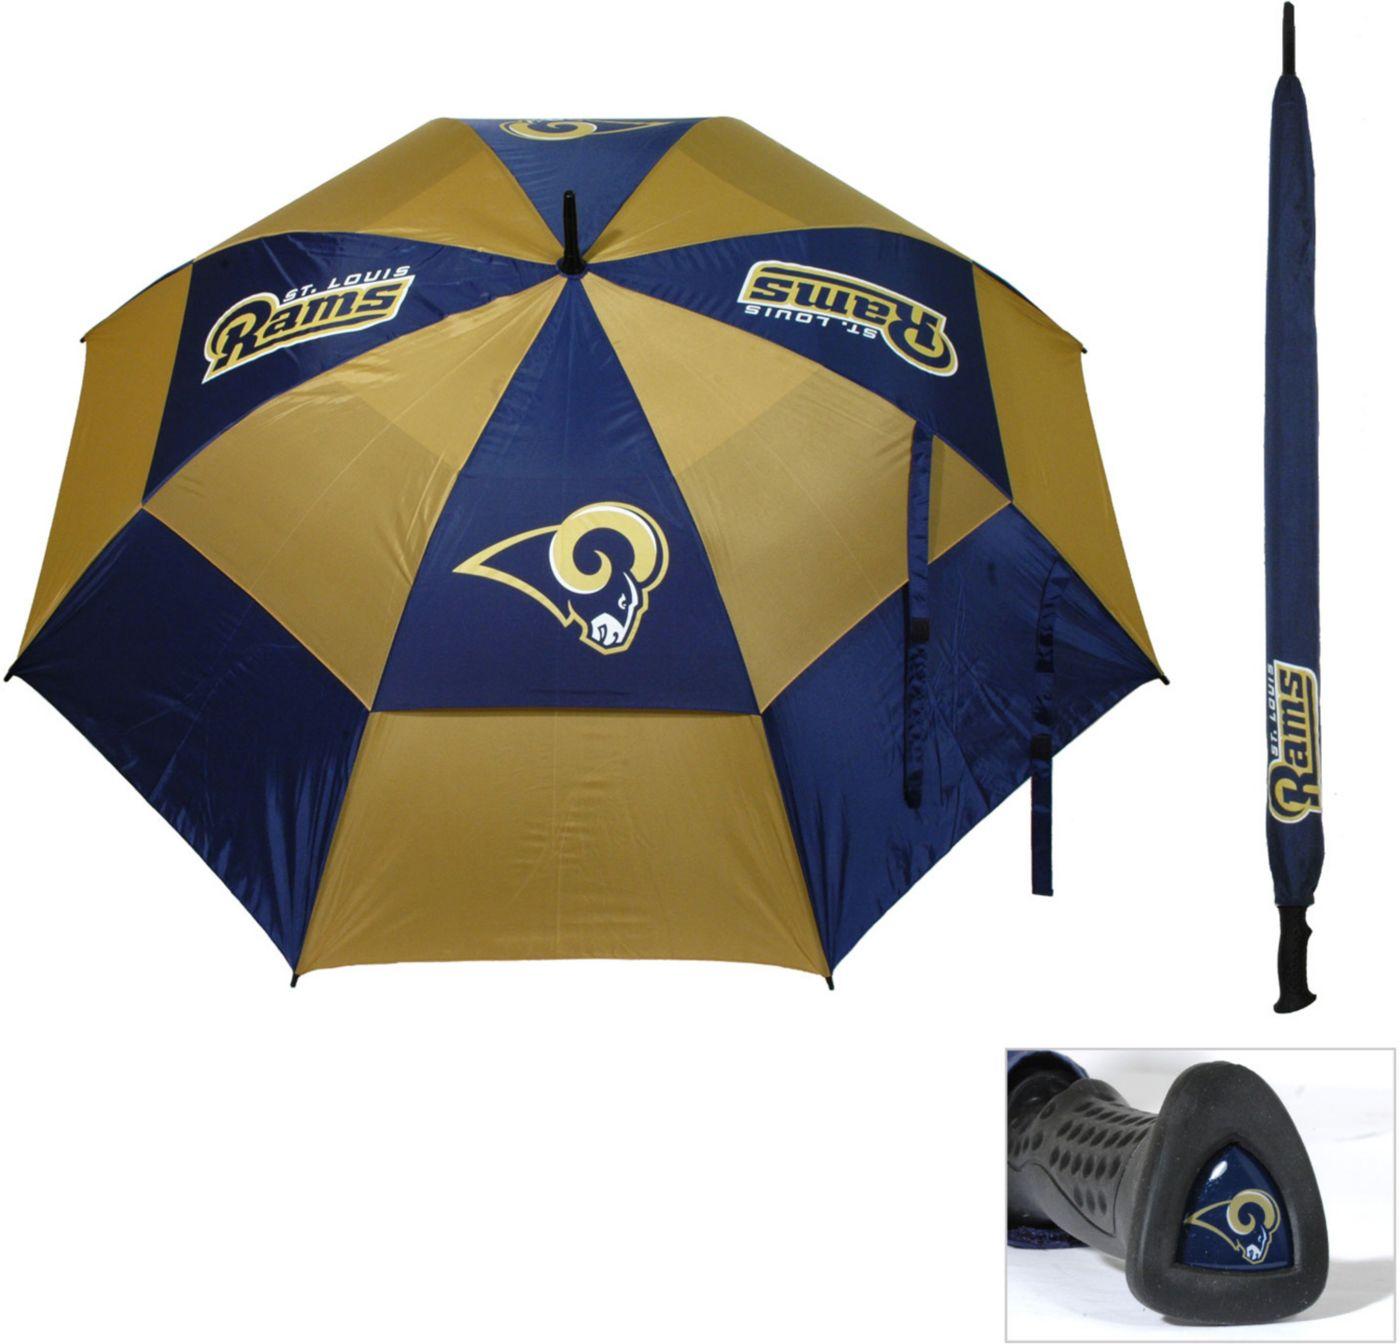 "Team Golf St. Louis Rams 62"" Double Canopy Umbrella"